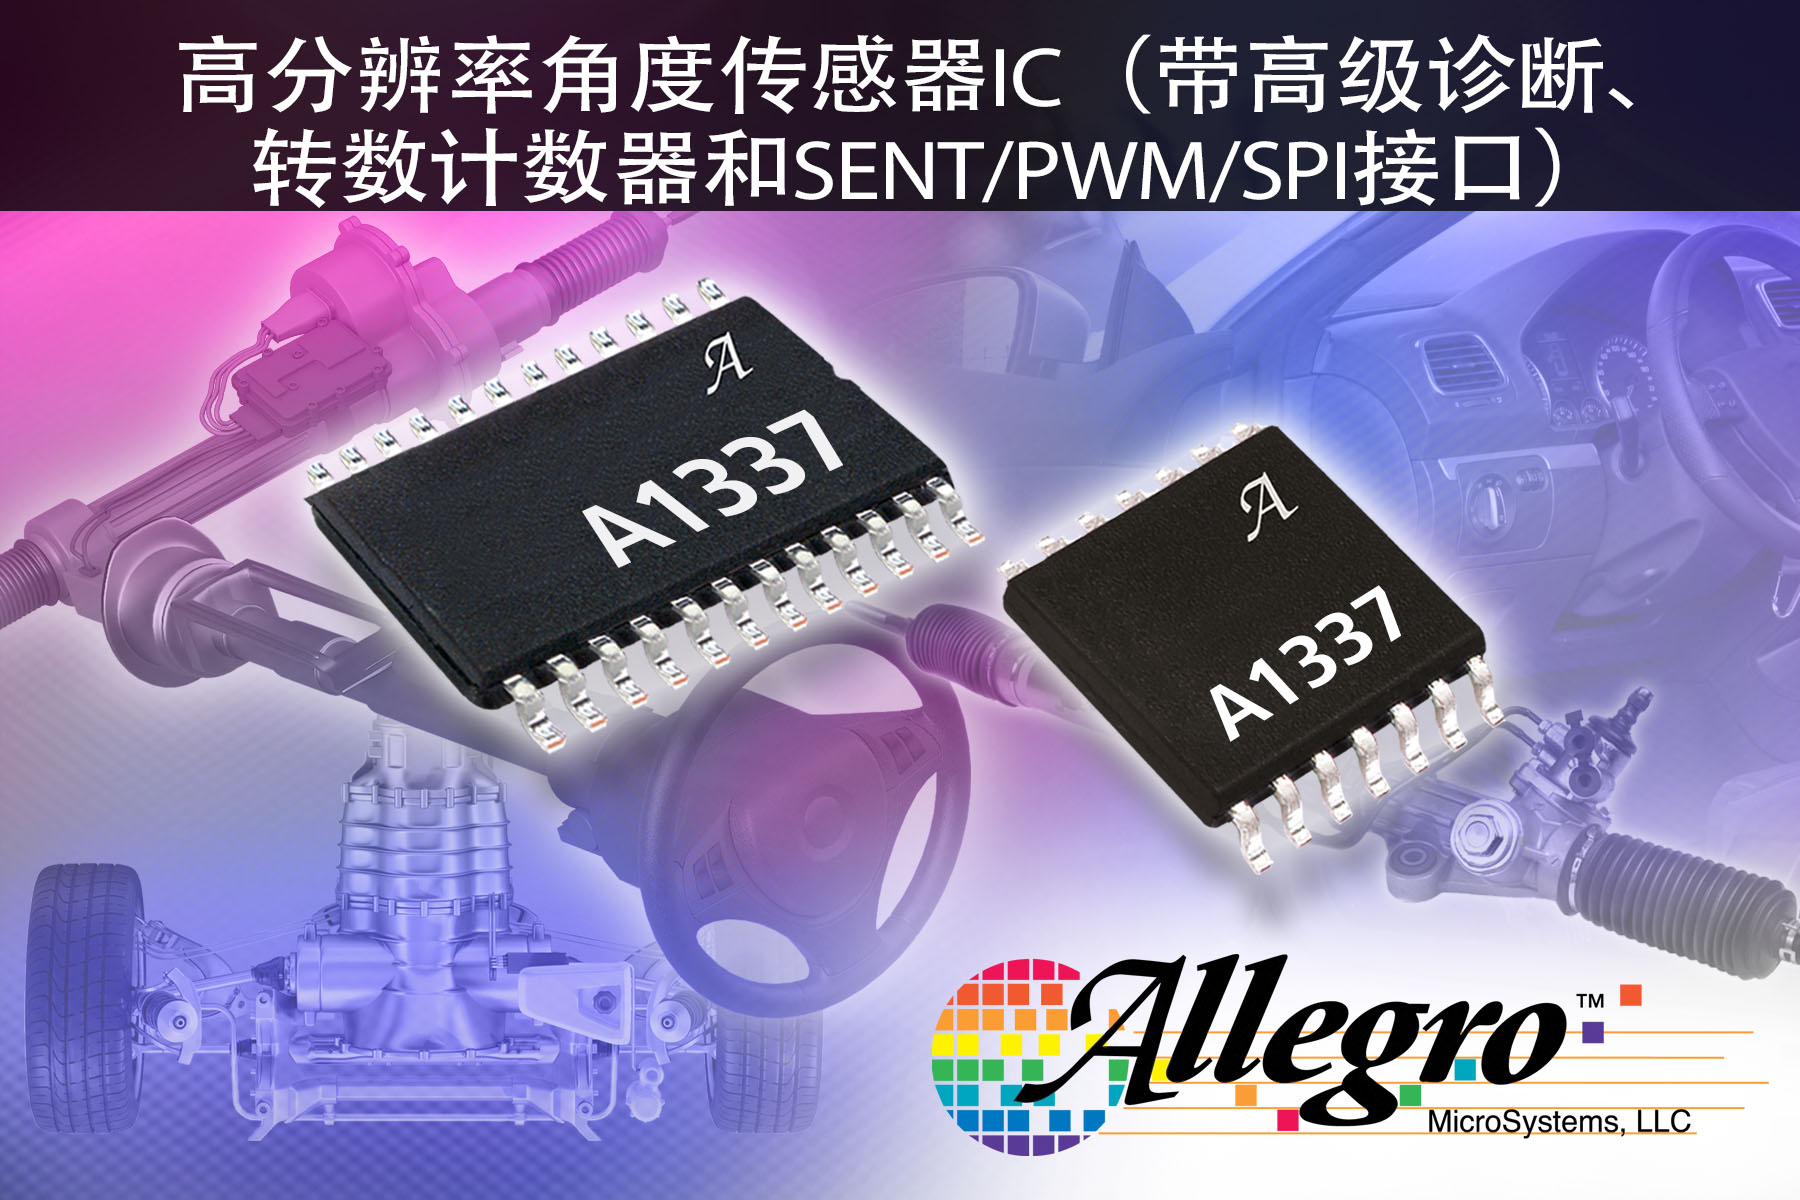 Allegro MicroSystems, LLC发布全新0到360° 角度传感器芯片